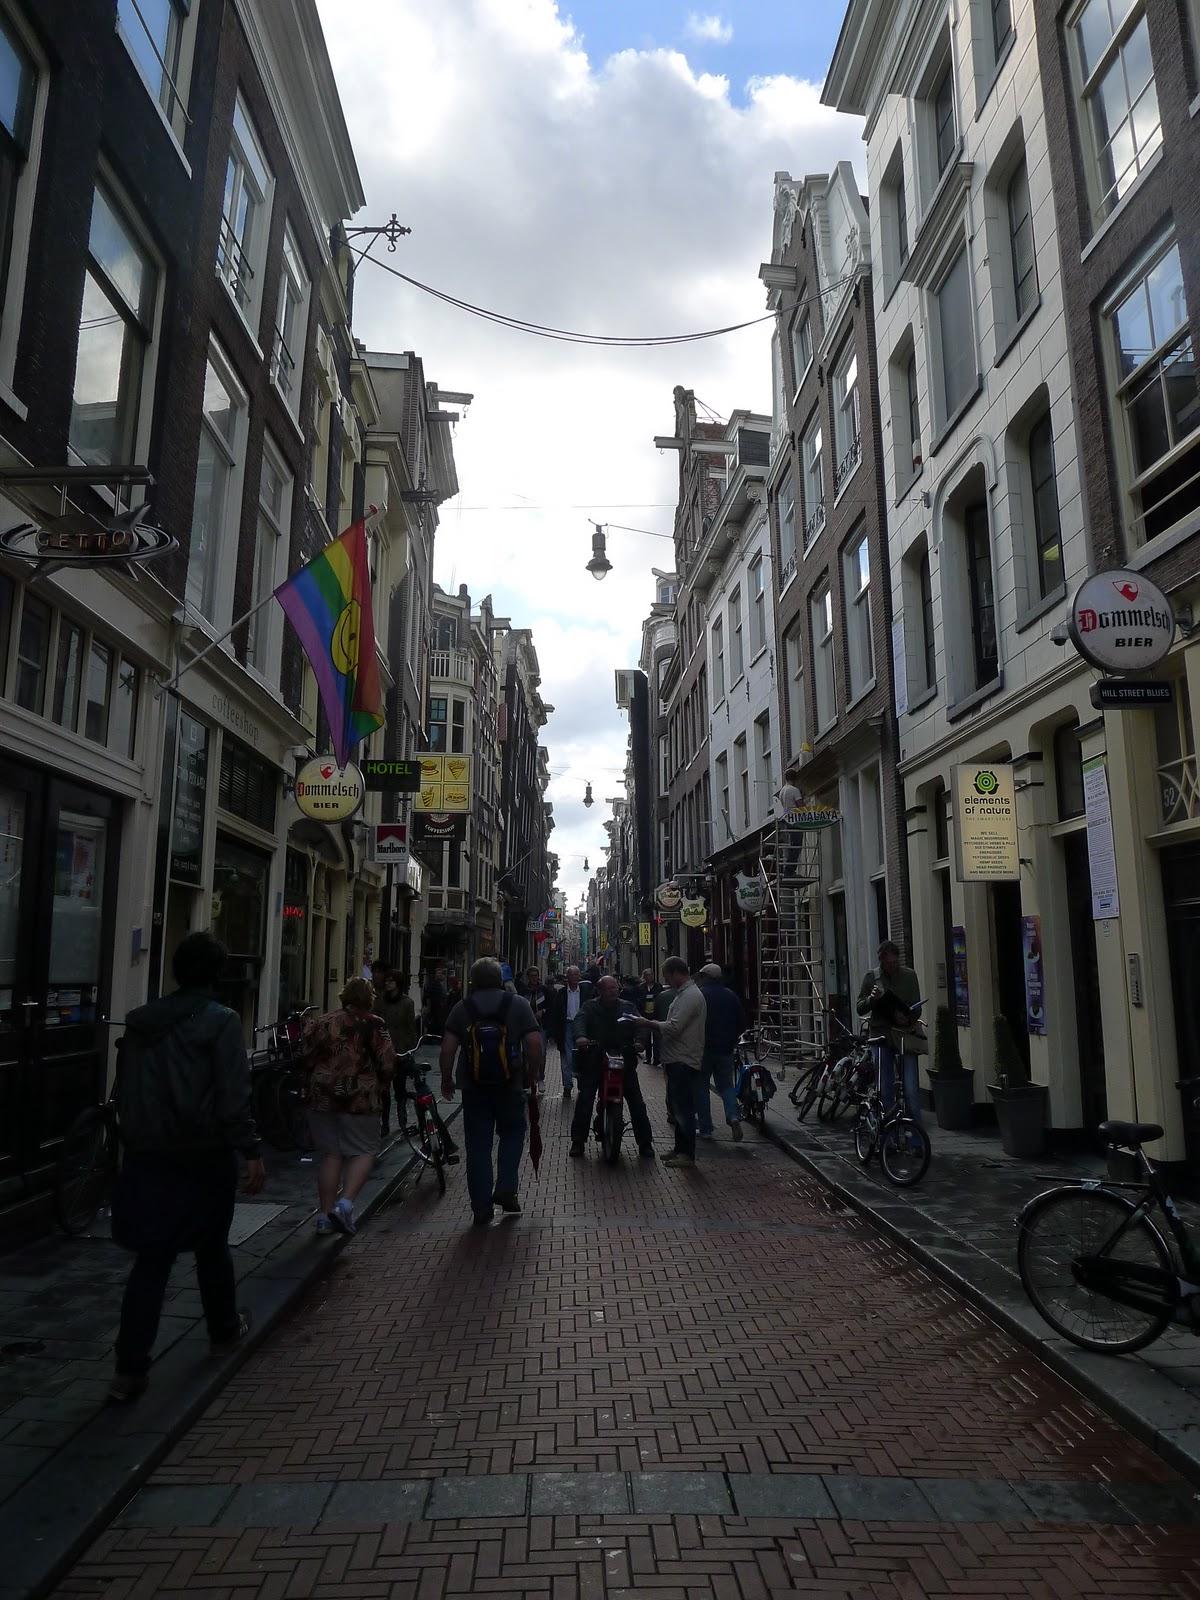 Peter Lau's Blog: Land Trip - Europe (Day 50-51: Amsterdam